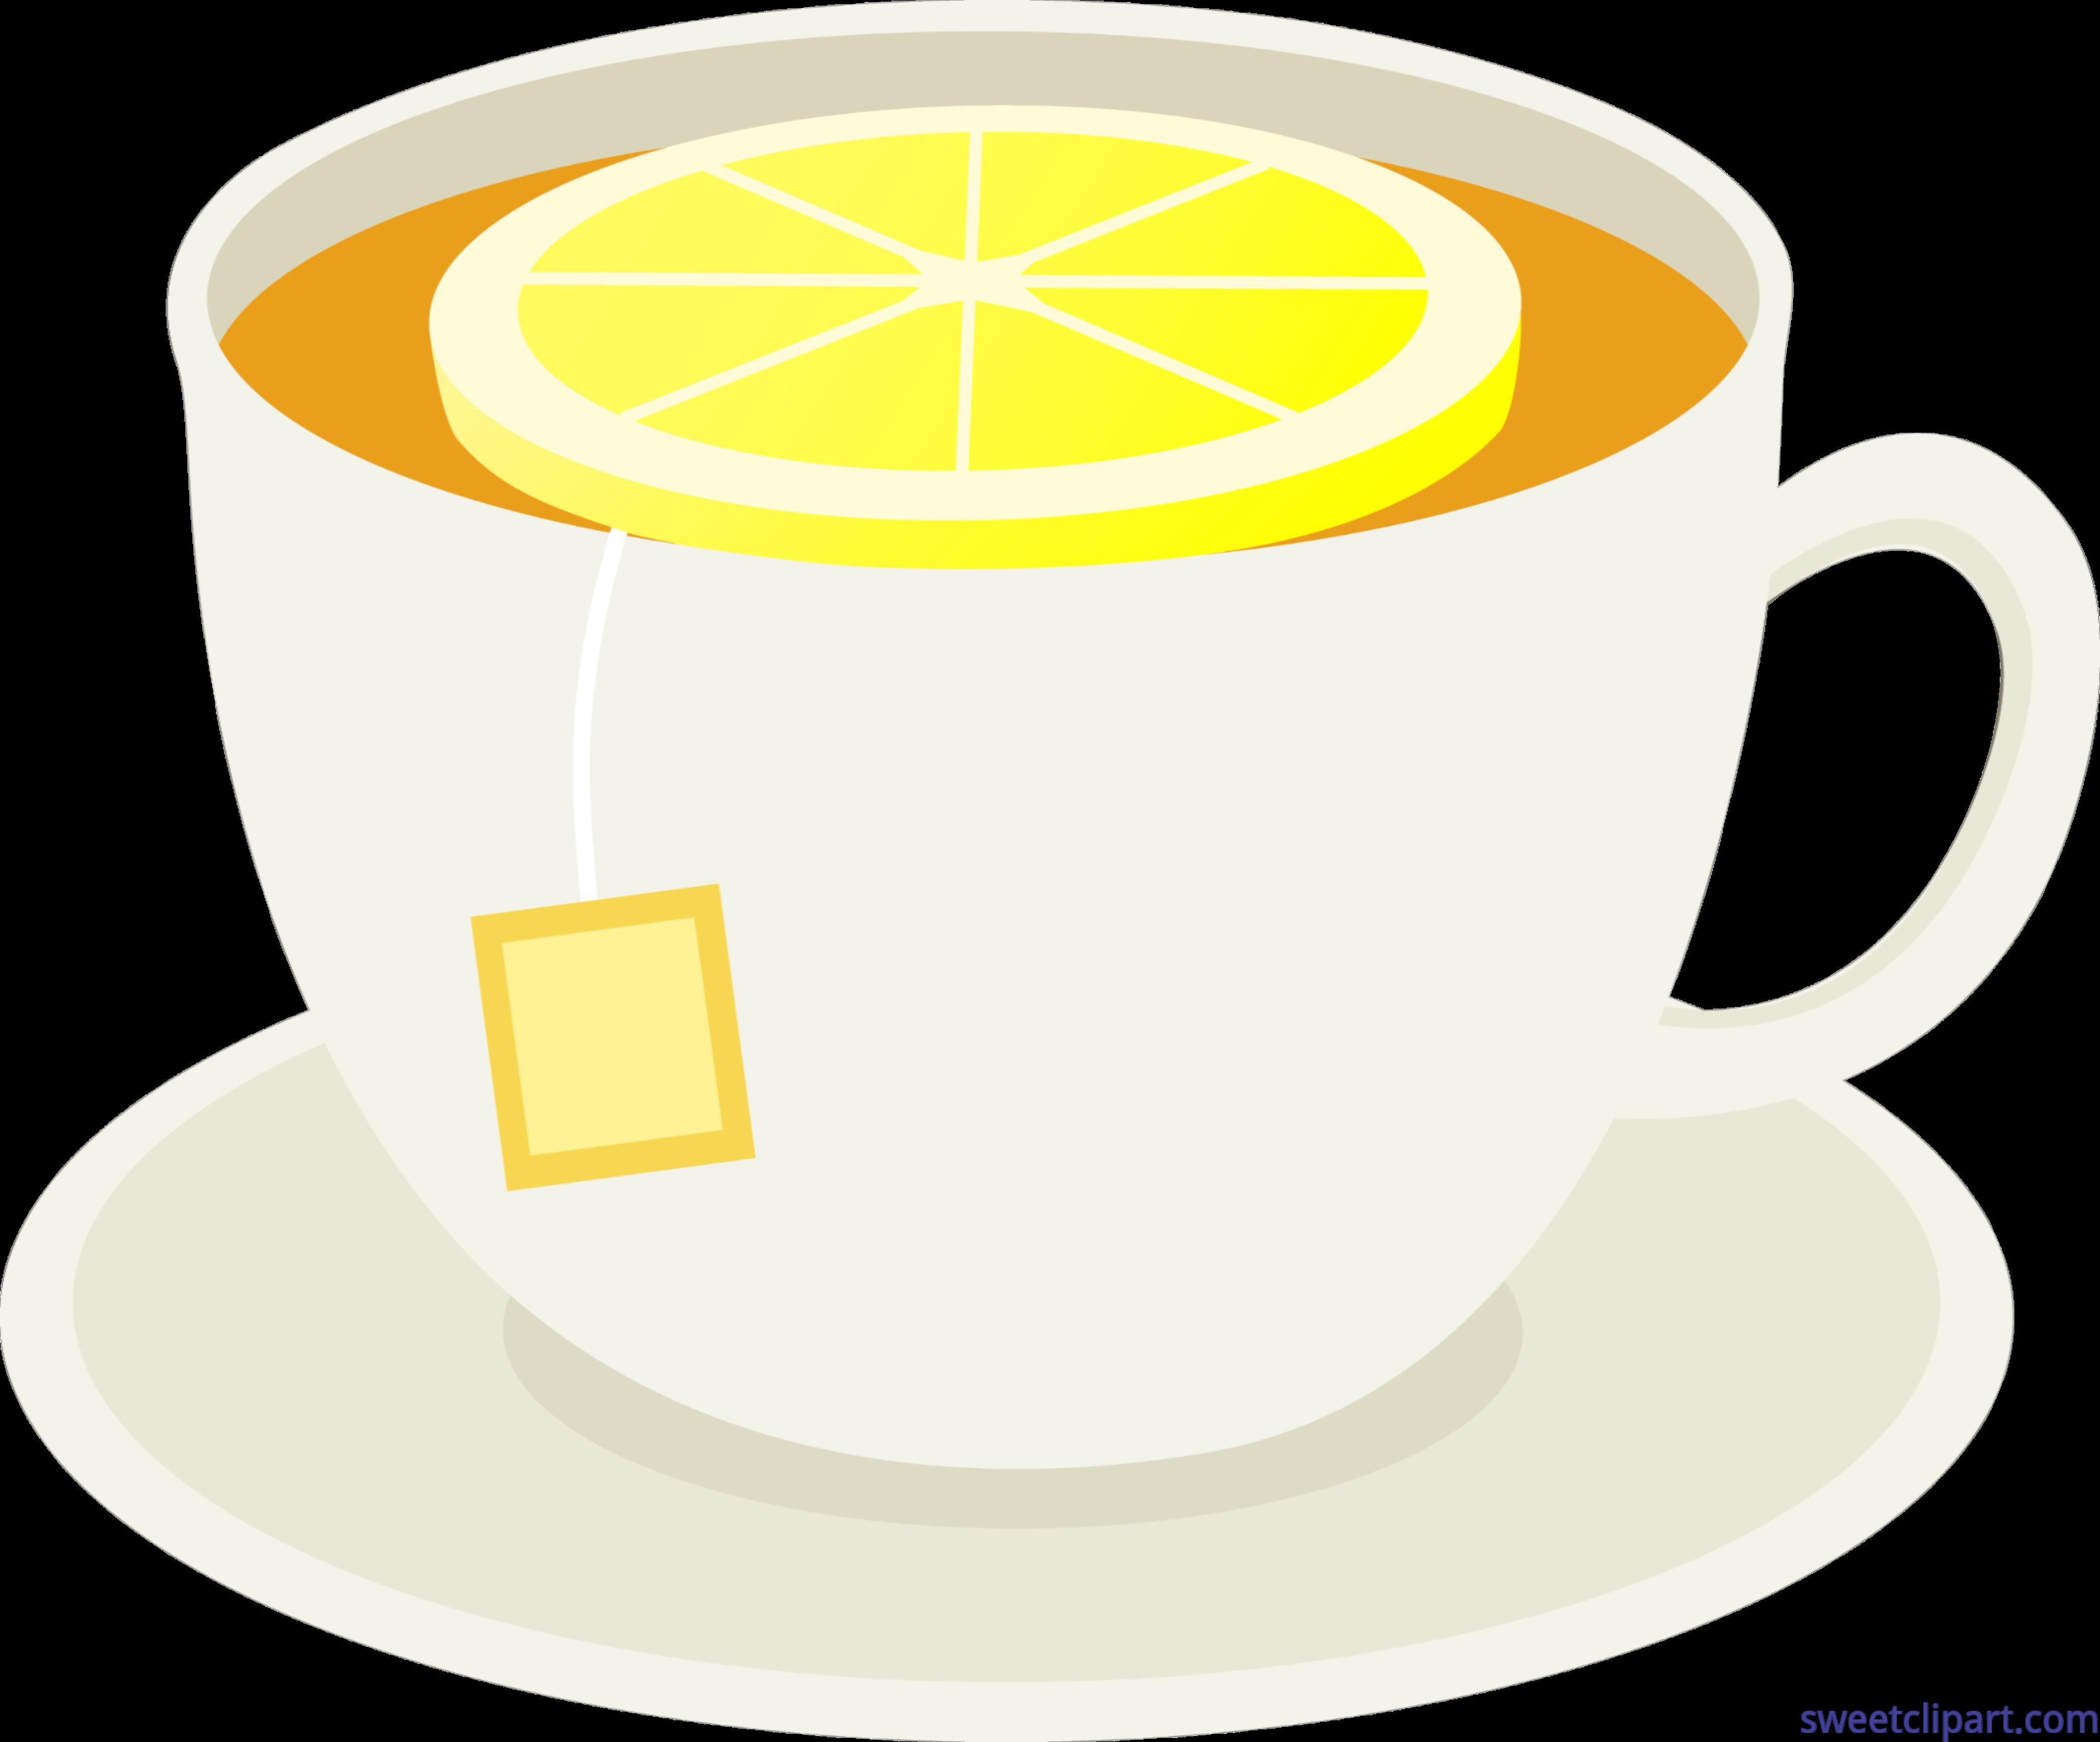 4173x3462 Cup Tea Lemon Slice Clip Art